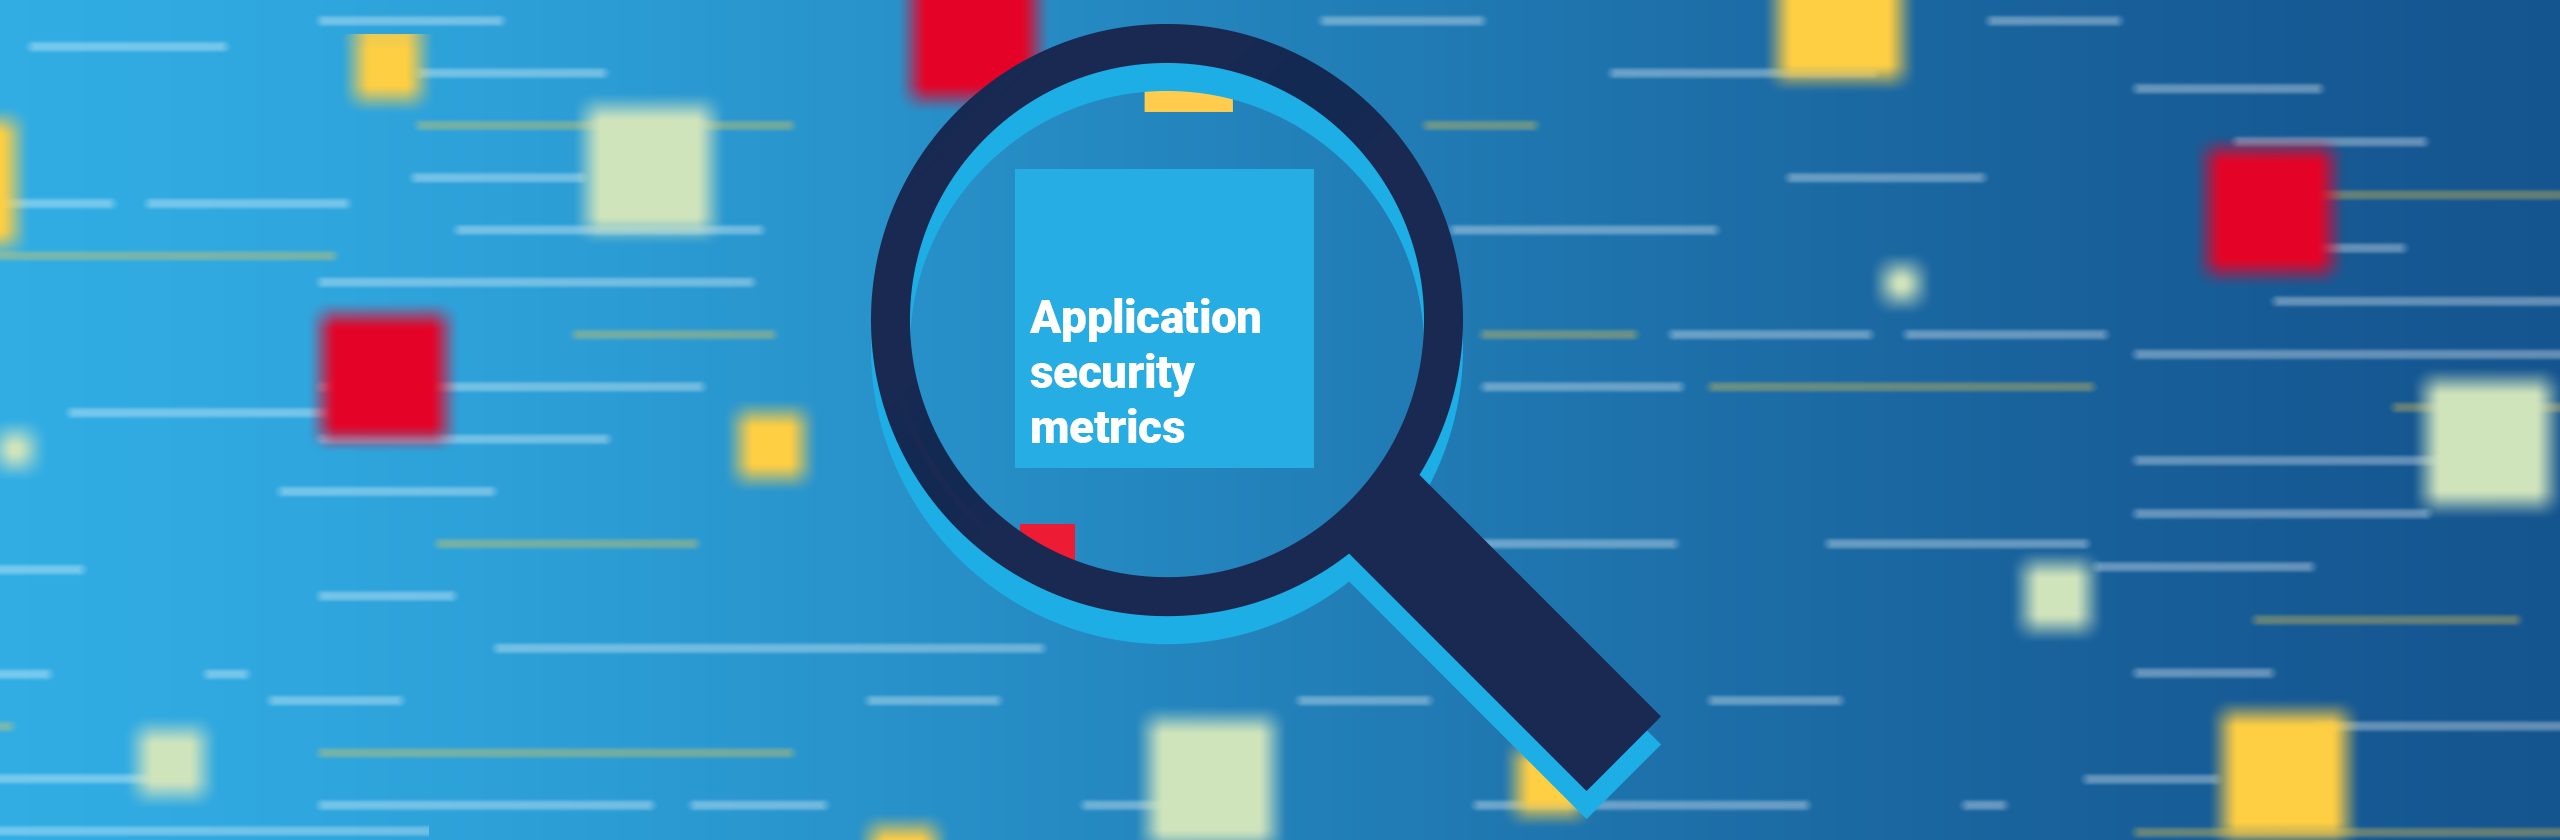 Application security metrics - banner